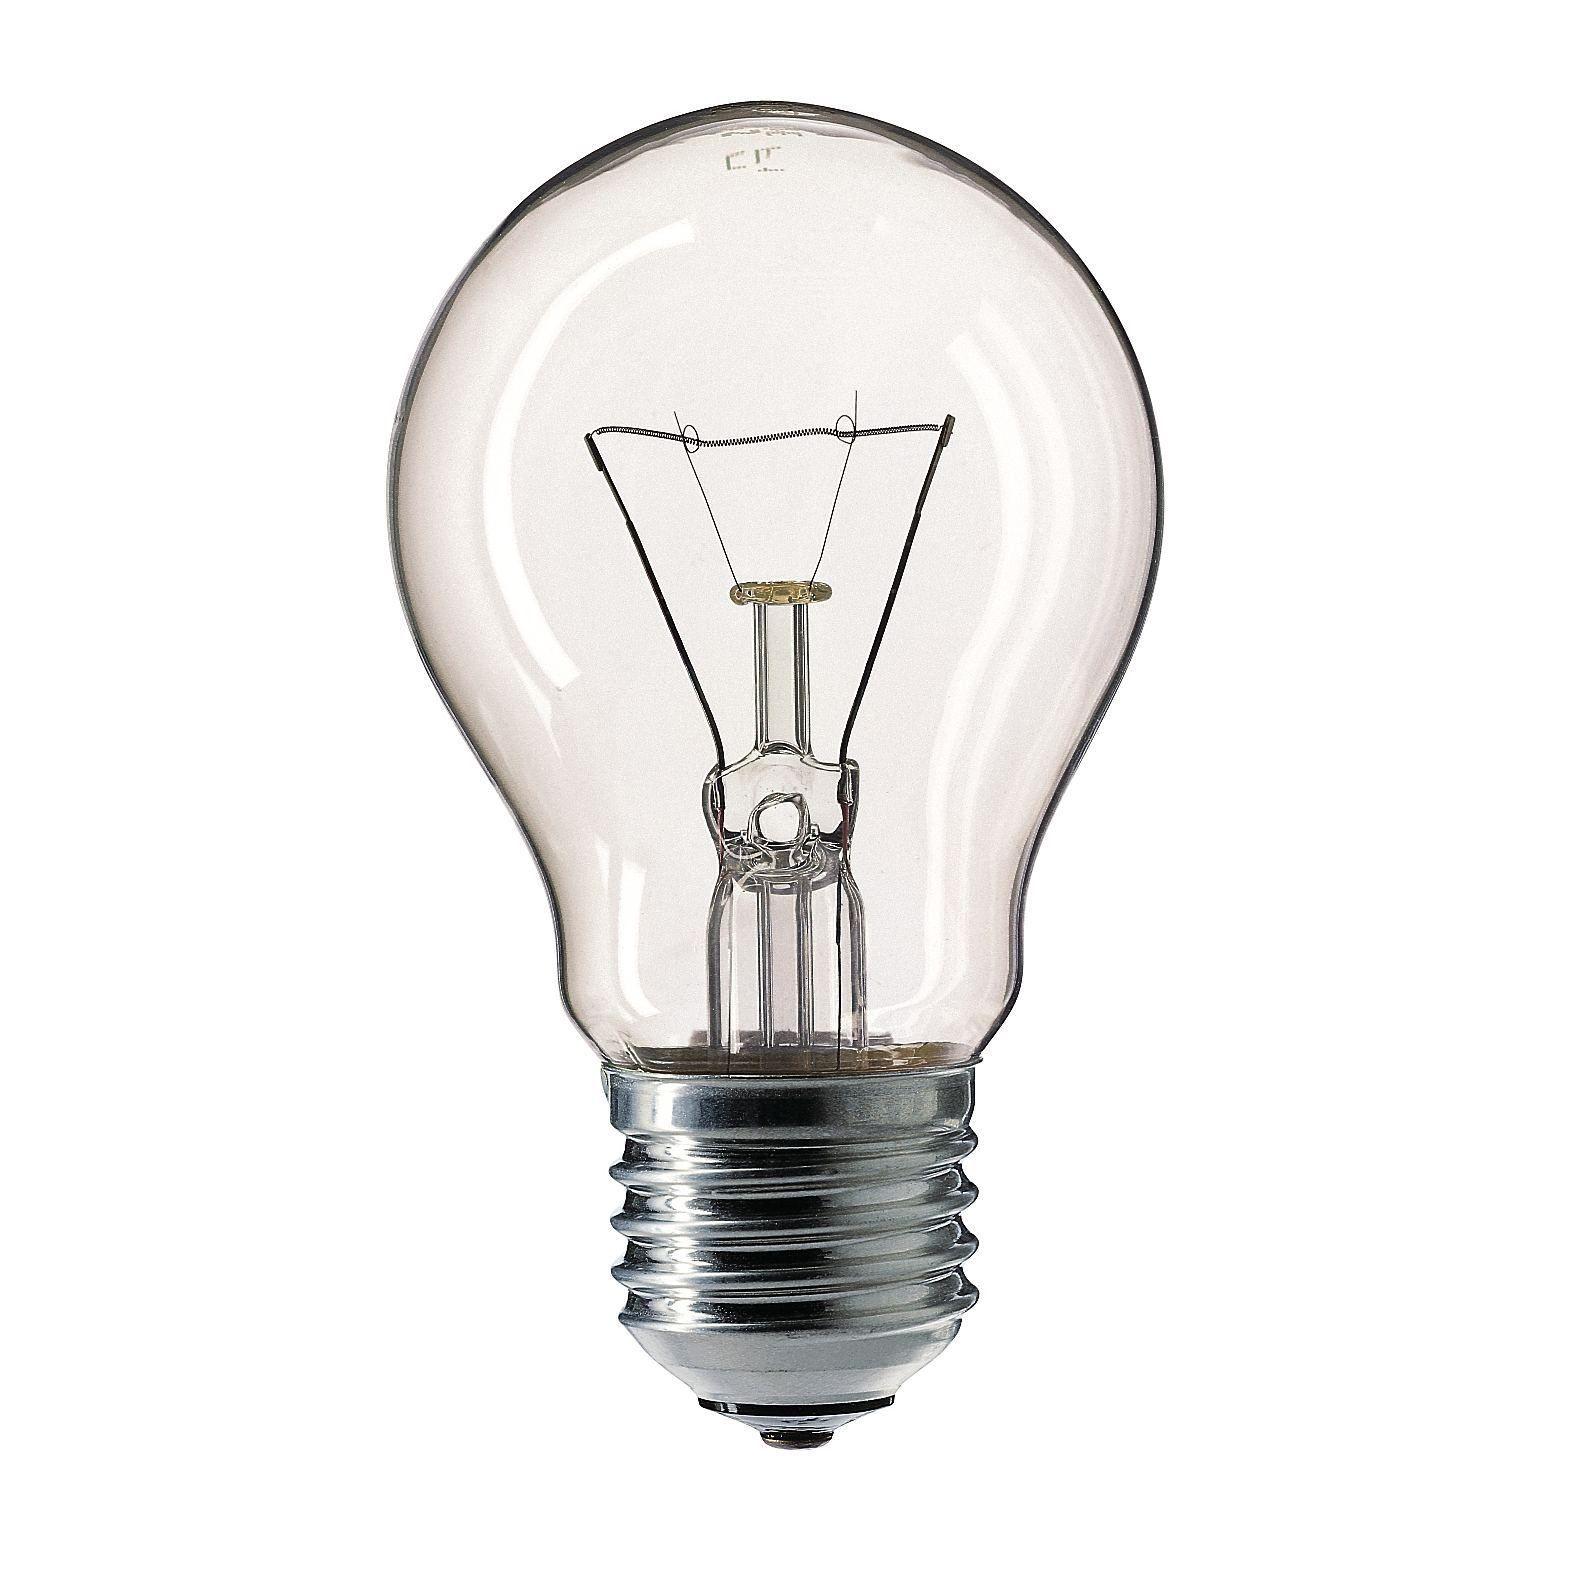 Купить Лампа накаливания Philips Stan 60W E27 230V A55 CL 1CT/12X10F прозрачная